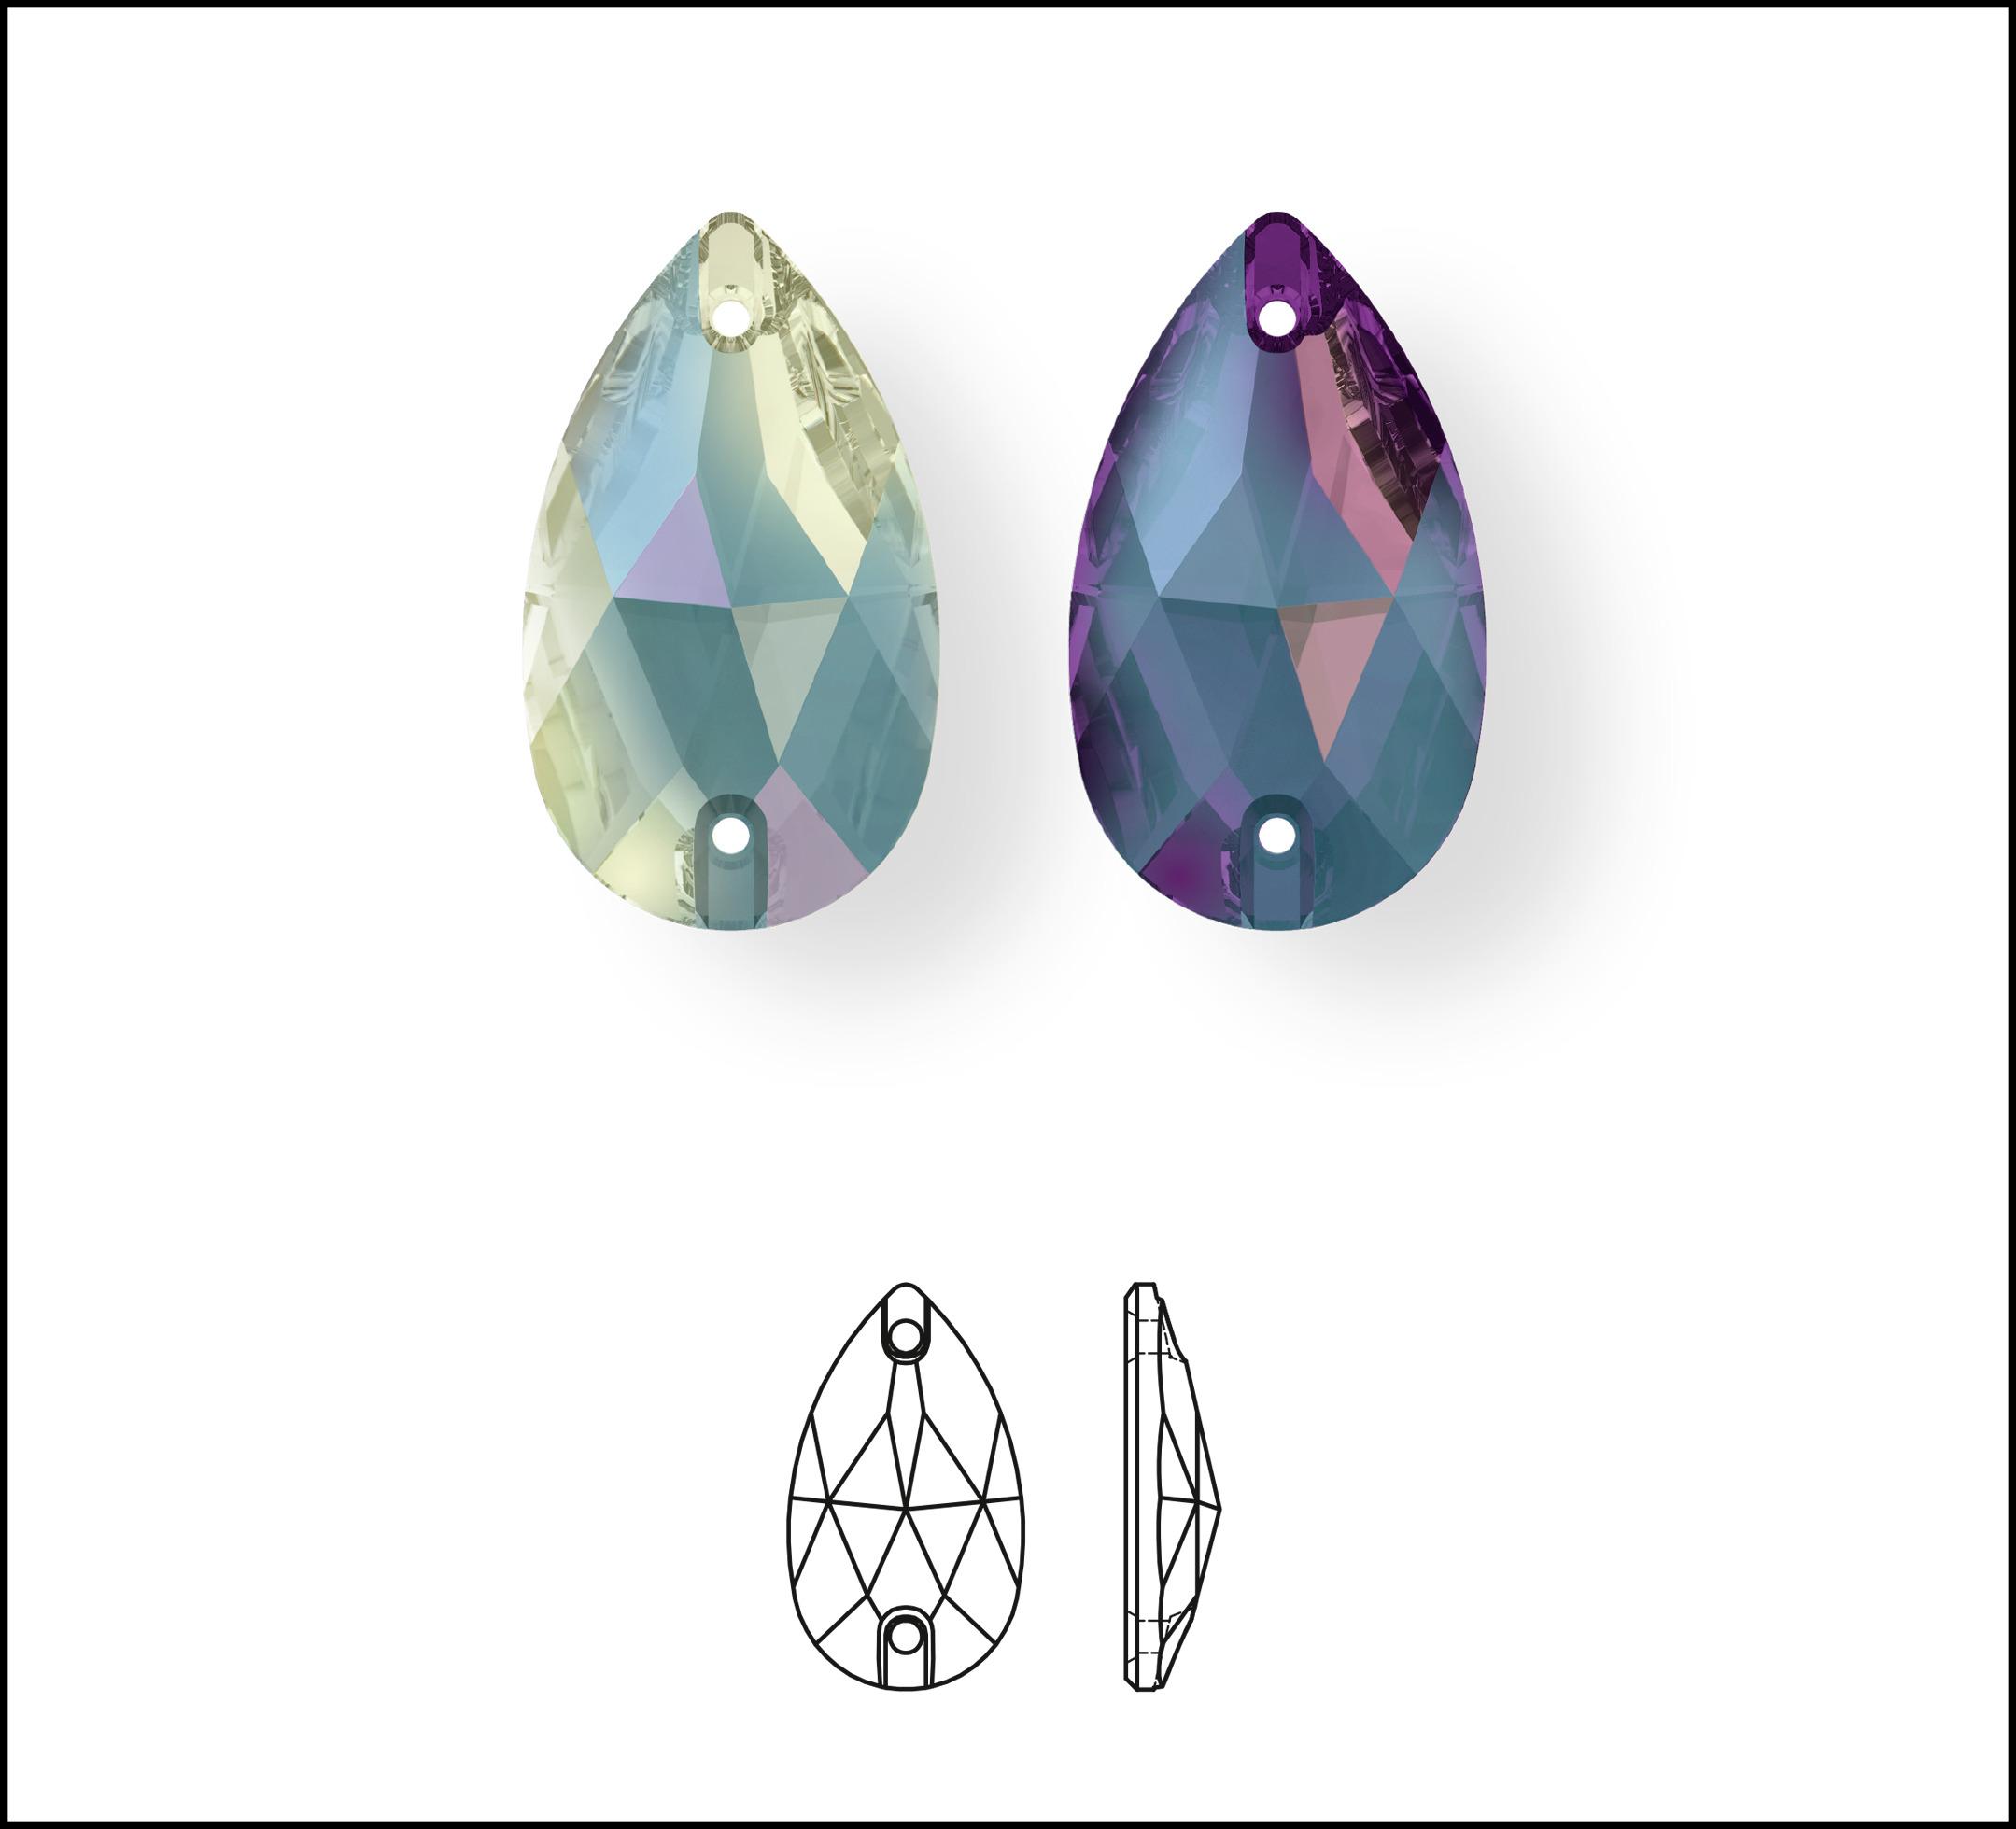 Swarovski_Crystal_ 3230_Nevette_Sew_On_Stone_ New_Crystal_DeLight_Effect